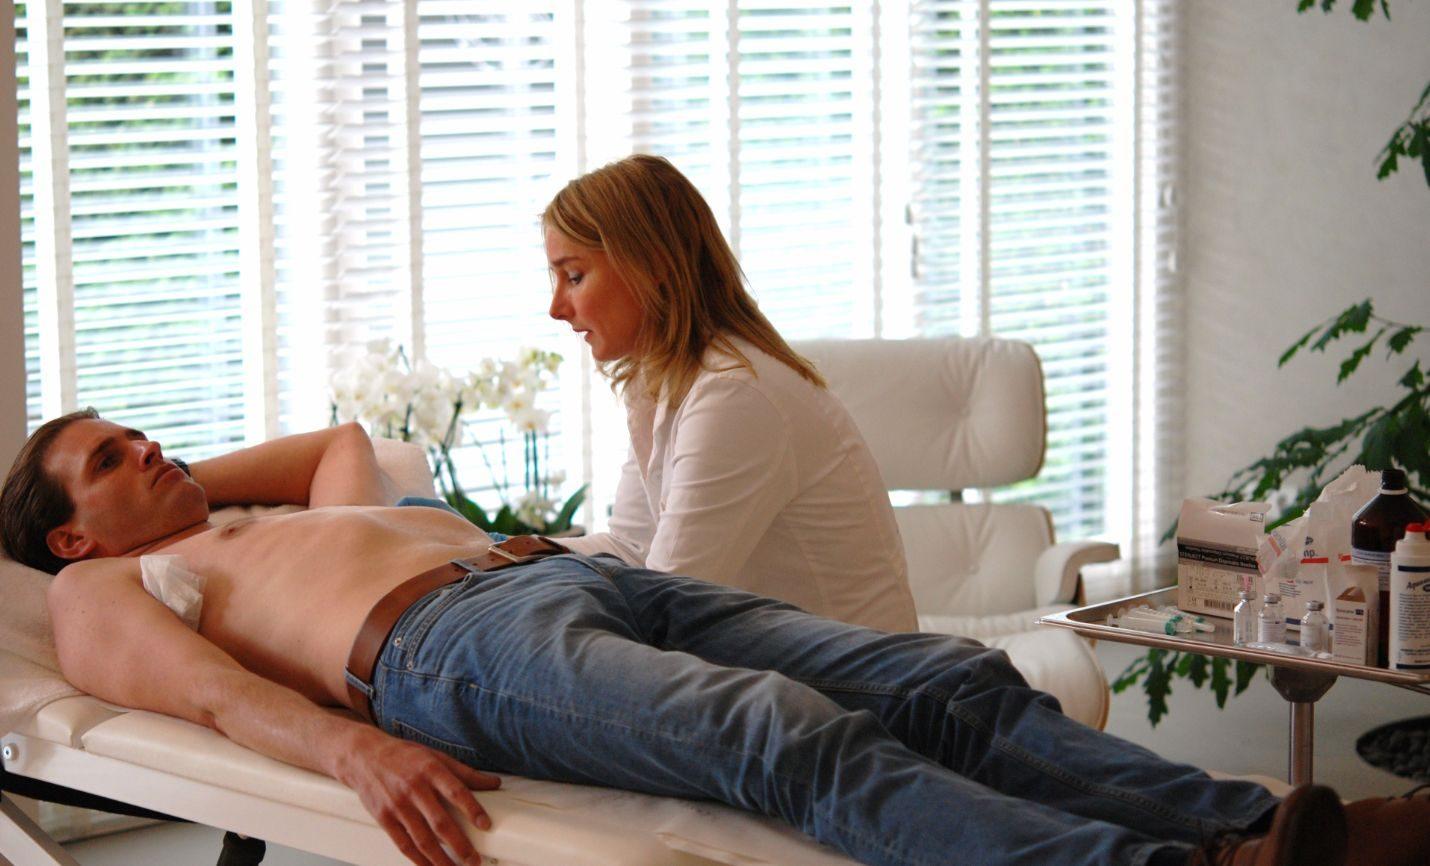 dermatoloog Aleida Dijkstra behandelt Mark met miraDry